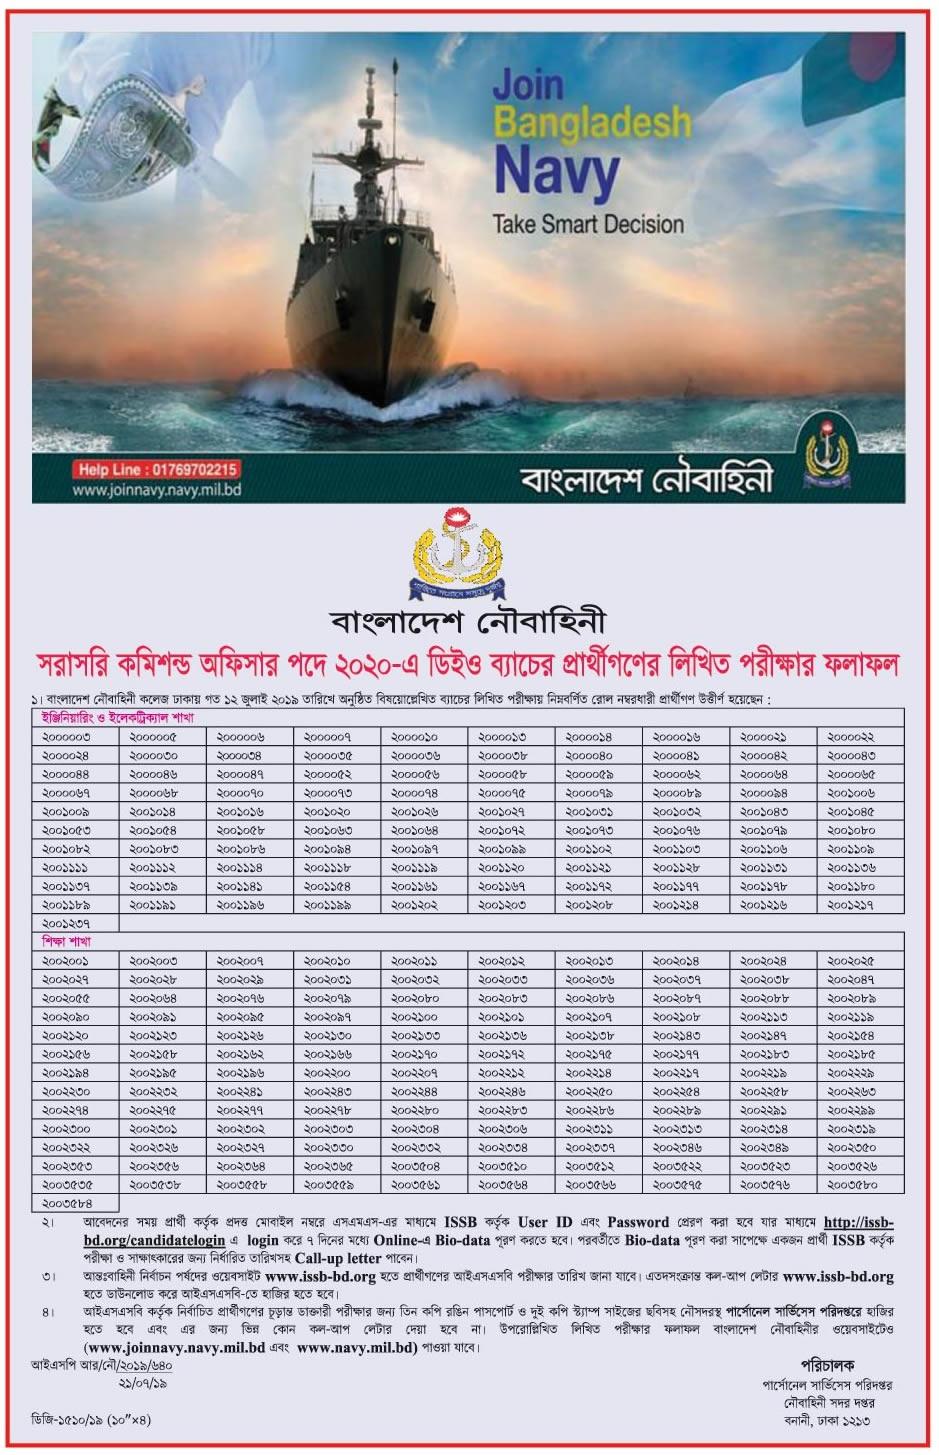 Bangladesh Navy Job Exam Result 2019